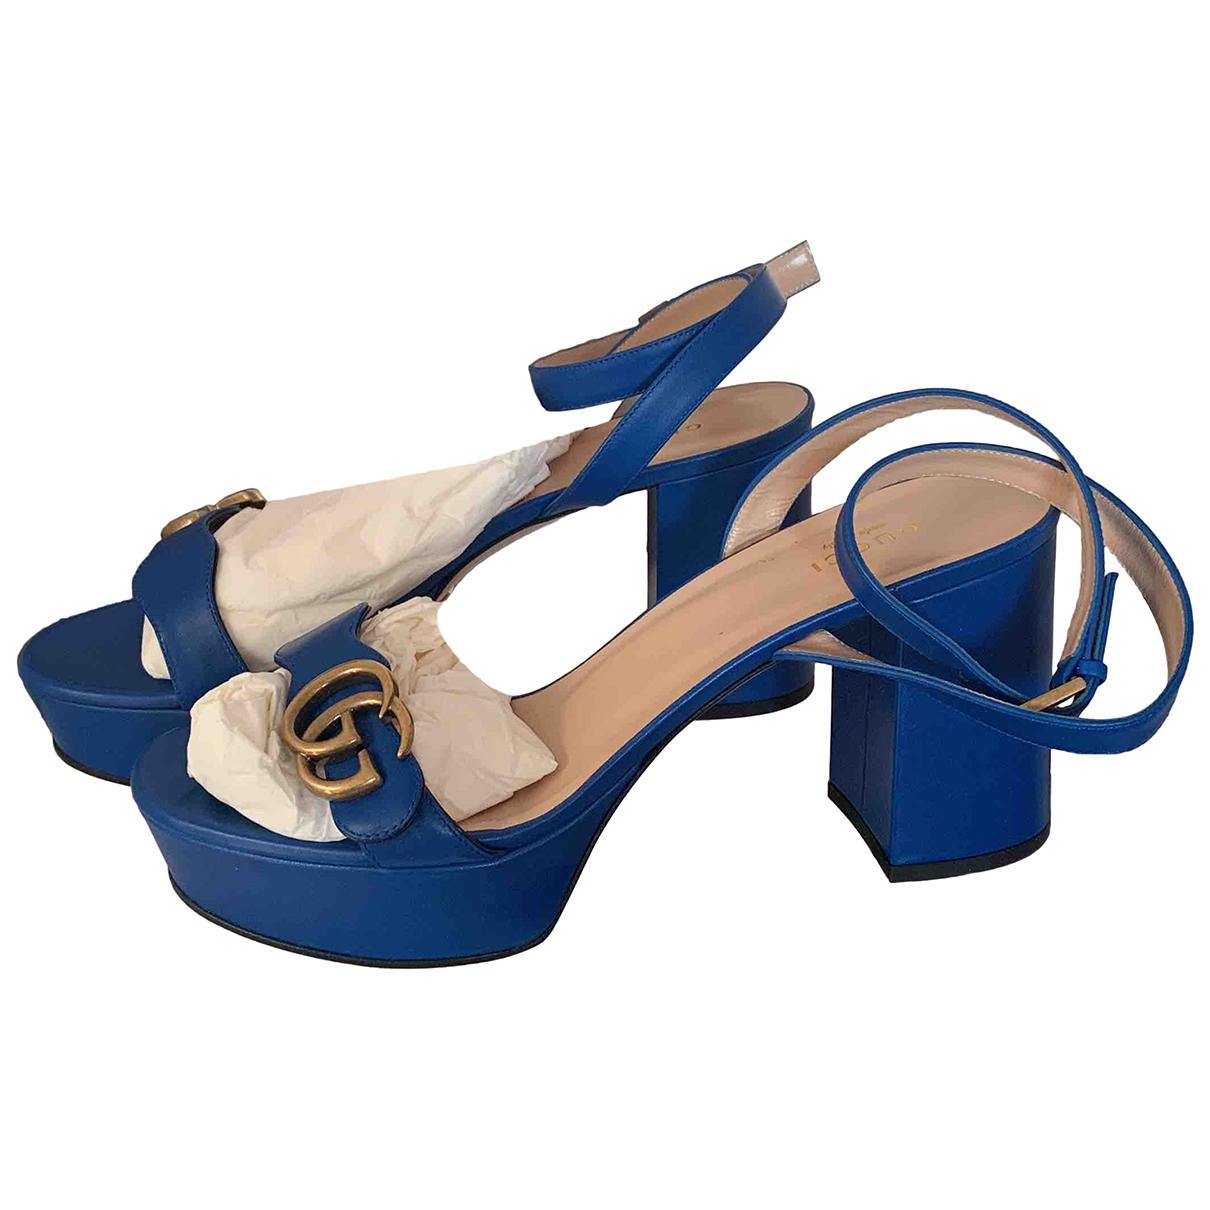 Gucci Marmont Sandalen in  Blau Leder